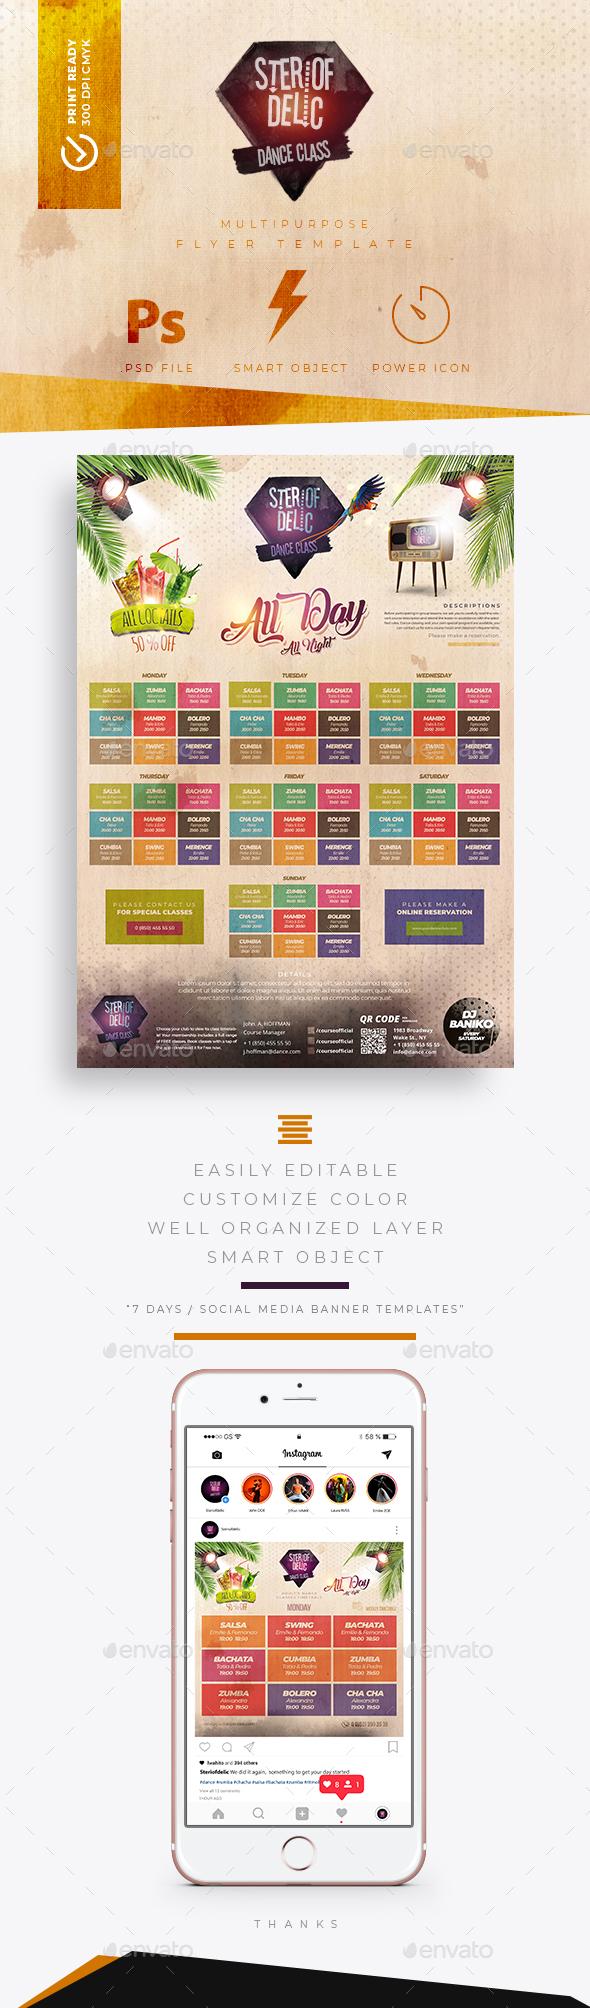 dance classes timetable schedule templates by rocketpixel